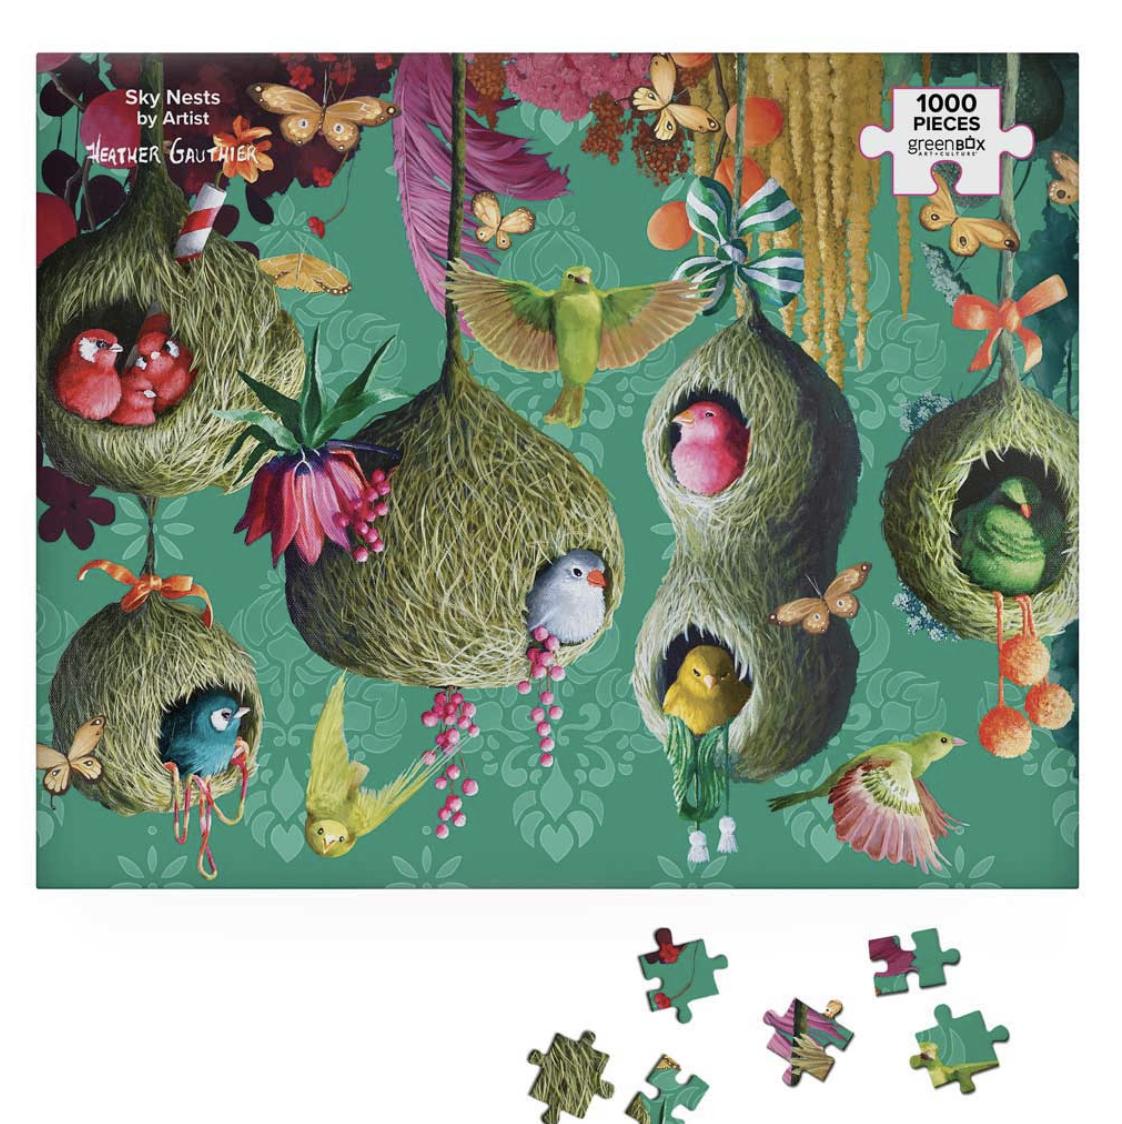 Sky Nests, 1000 Piece Puzzle